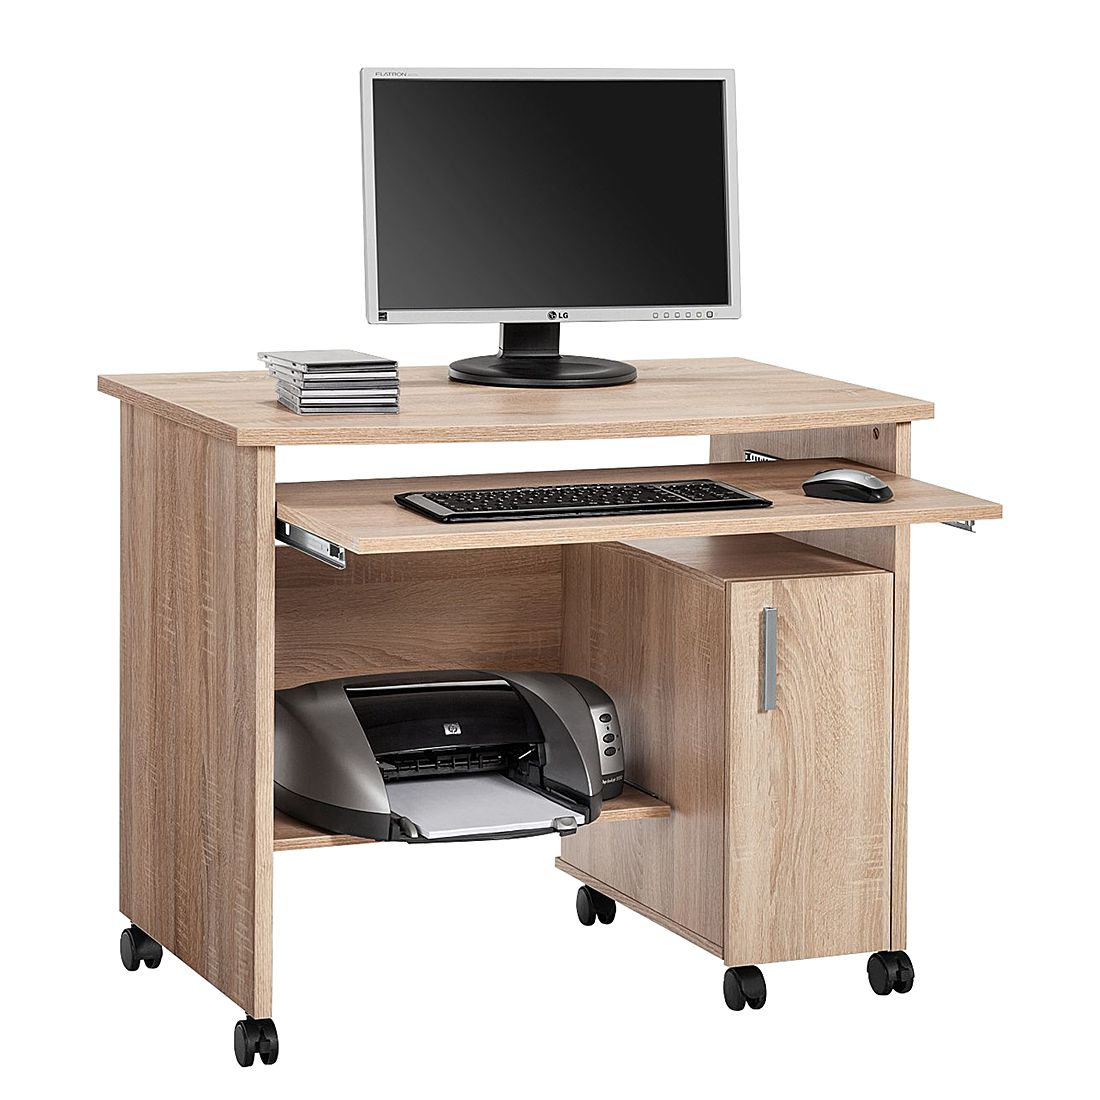 Bureau pour ordinateur Orla - Imitation chêne de Sonoma, Maja Möbel